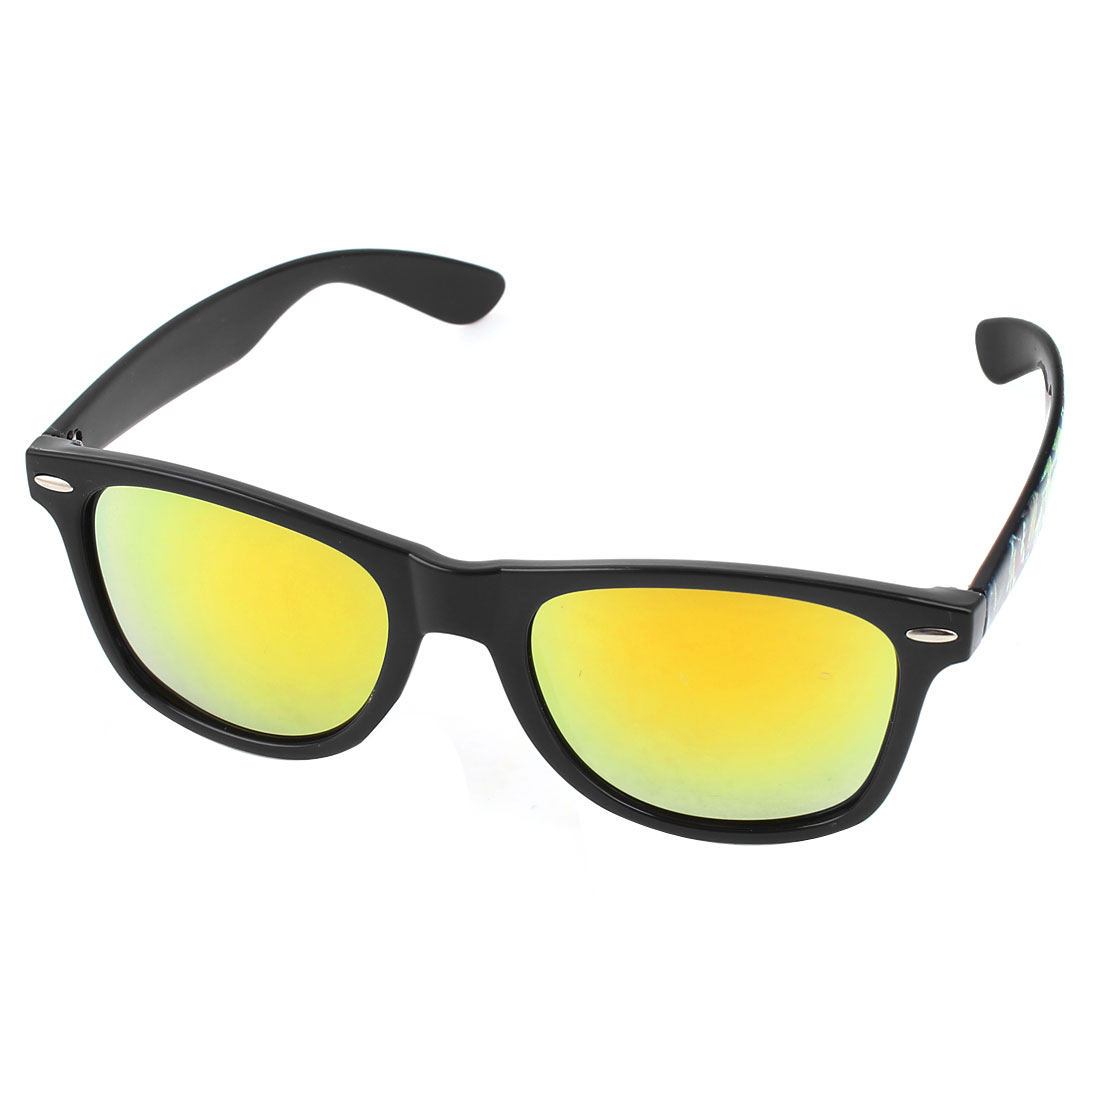 Black Full Frame Single Bridge Yellow Lens Sunglasses Eyewear for Lady